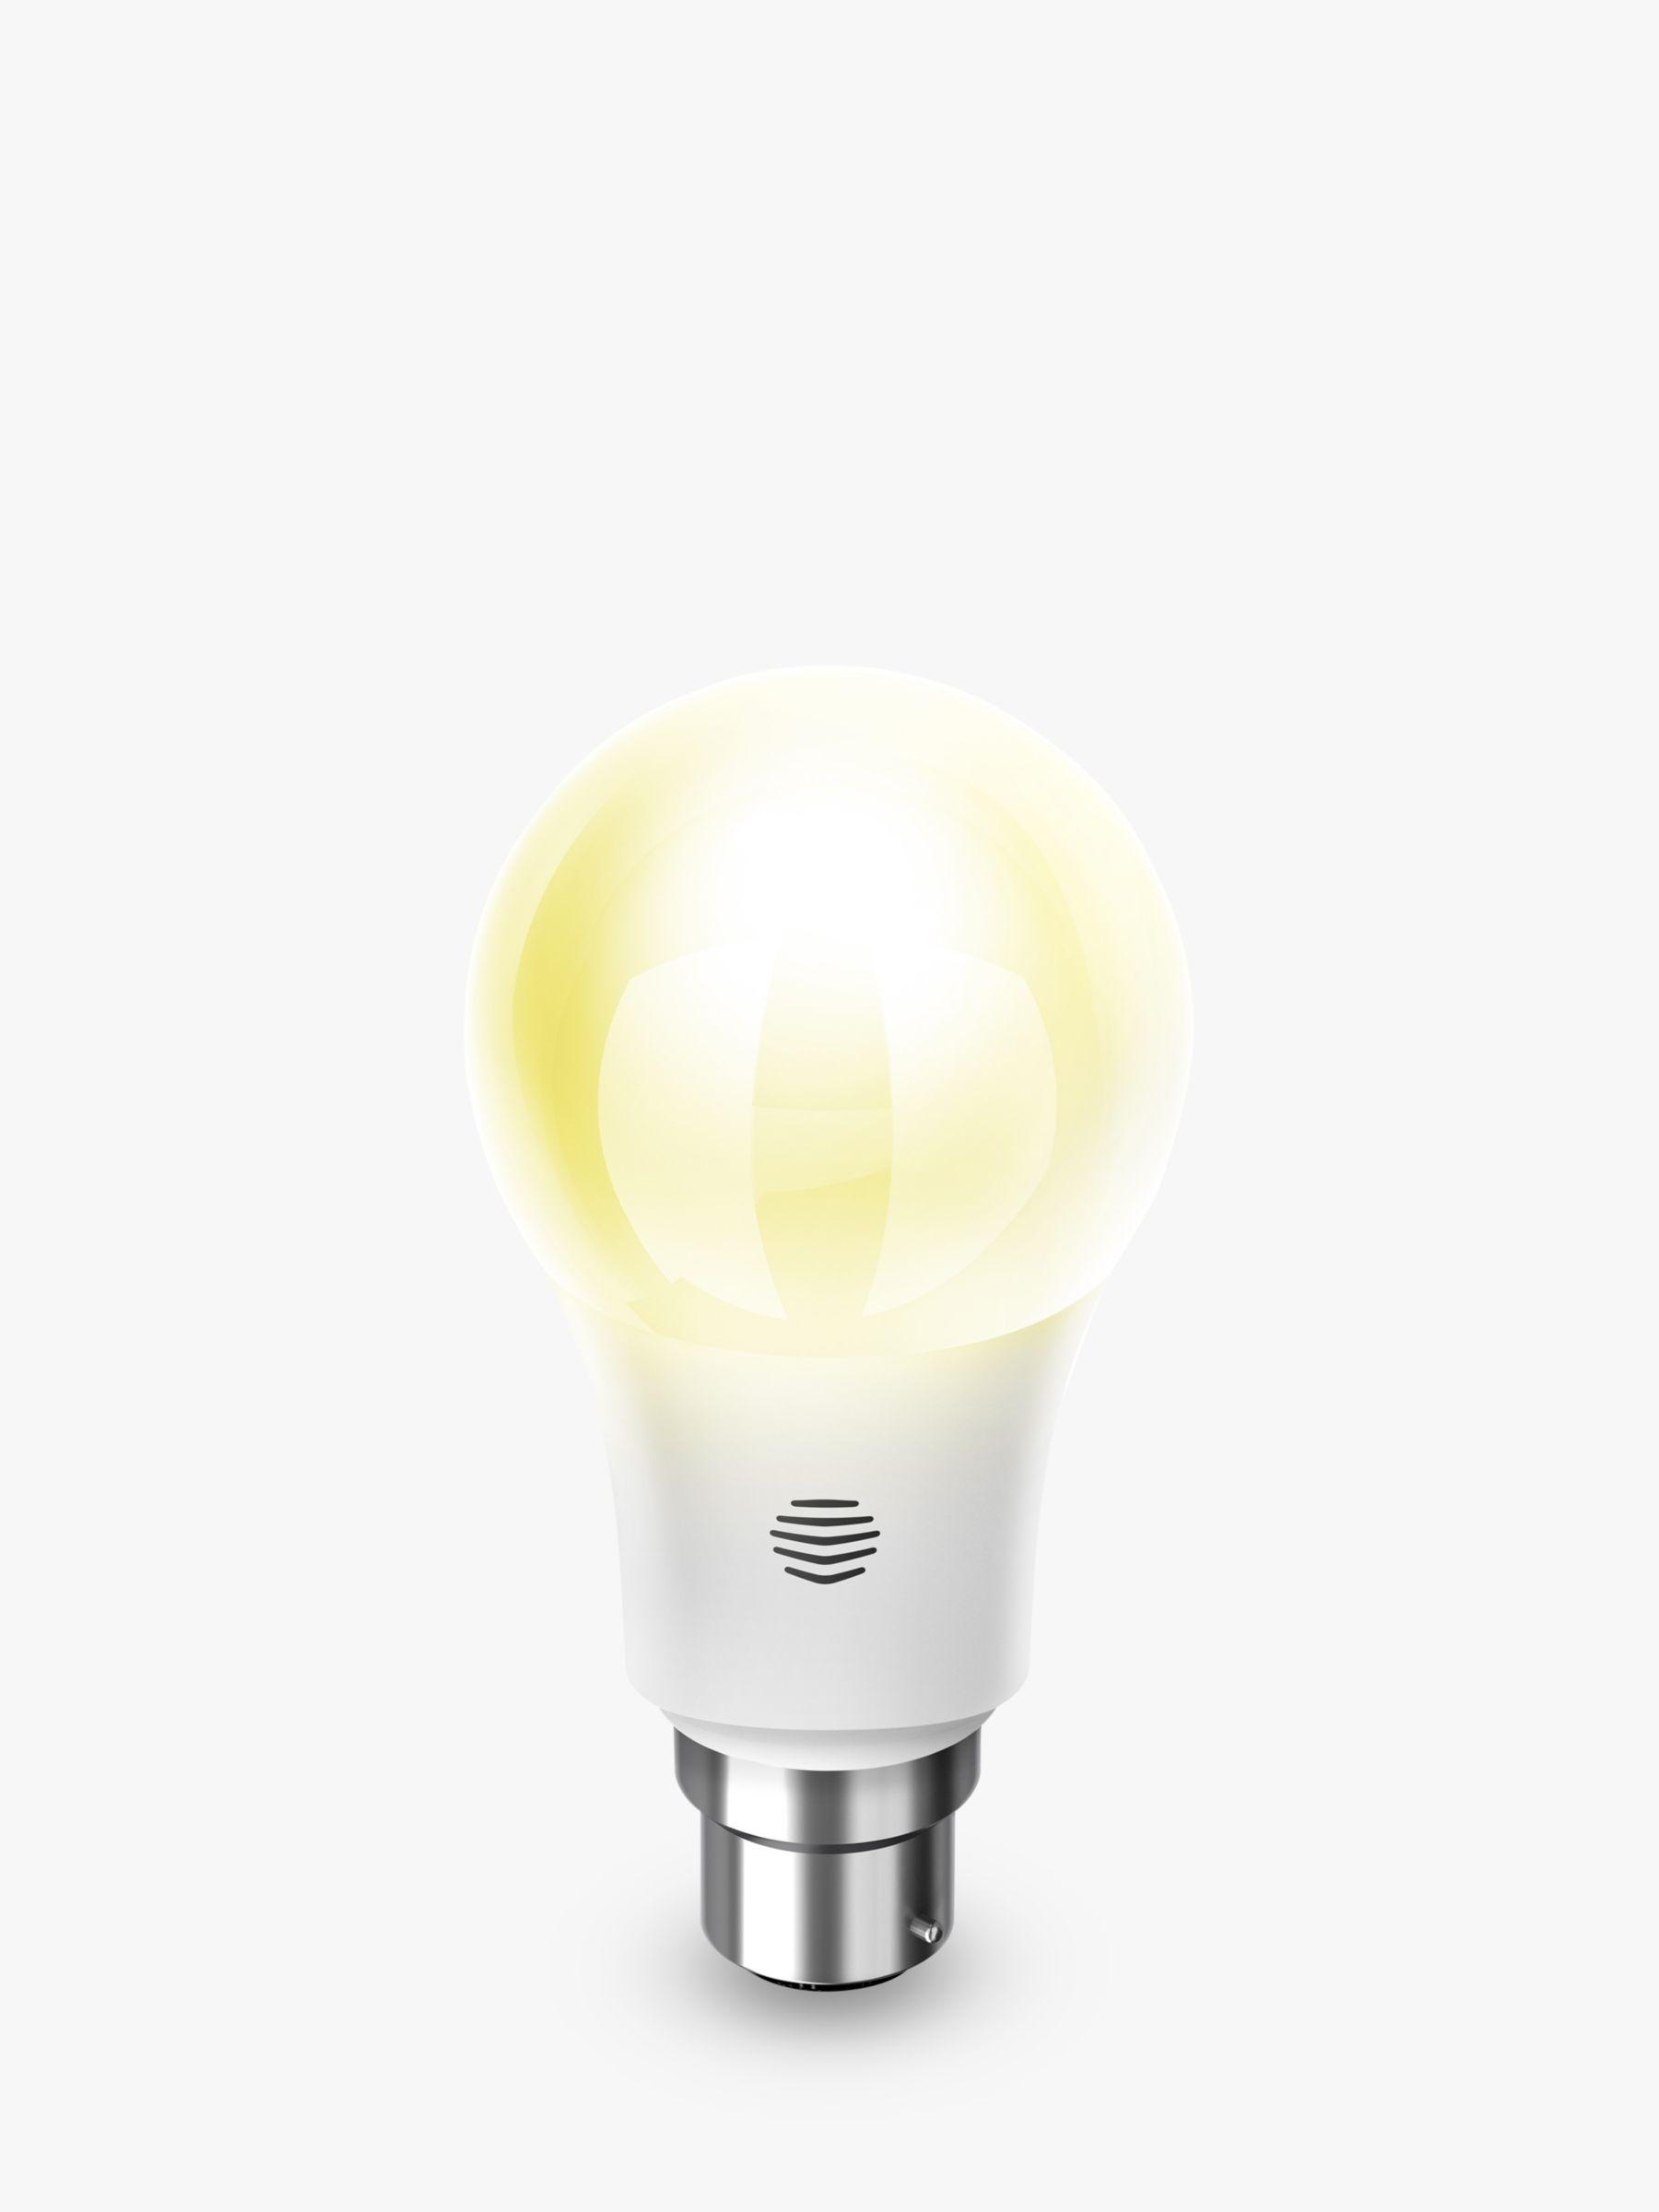 Hive Active Light Dimmable Warm White Wireless Lighting LED Light Bulb, 9W A60 B22 Bayonet Bulb, Single